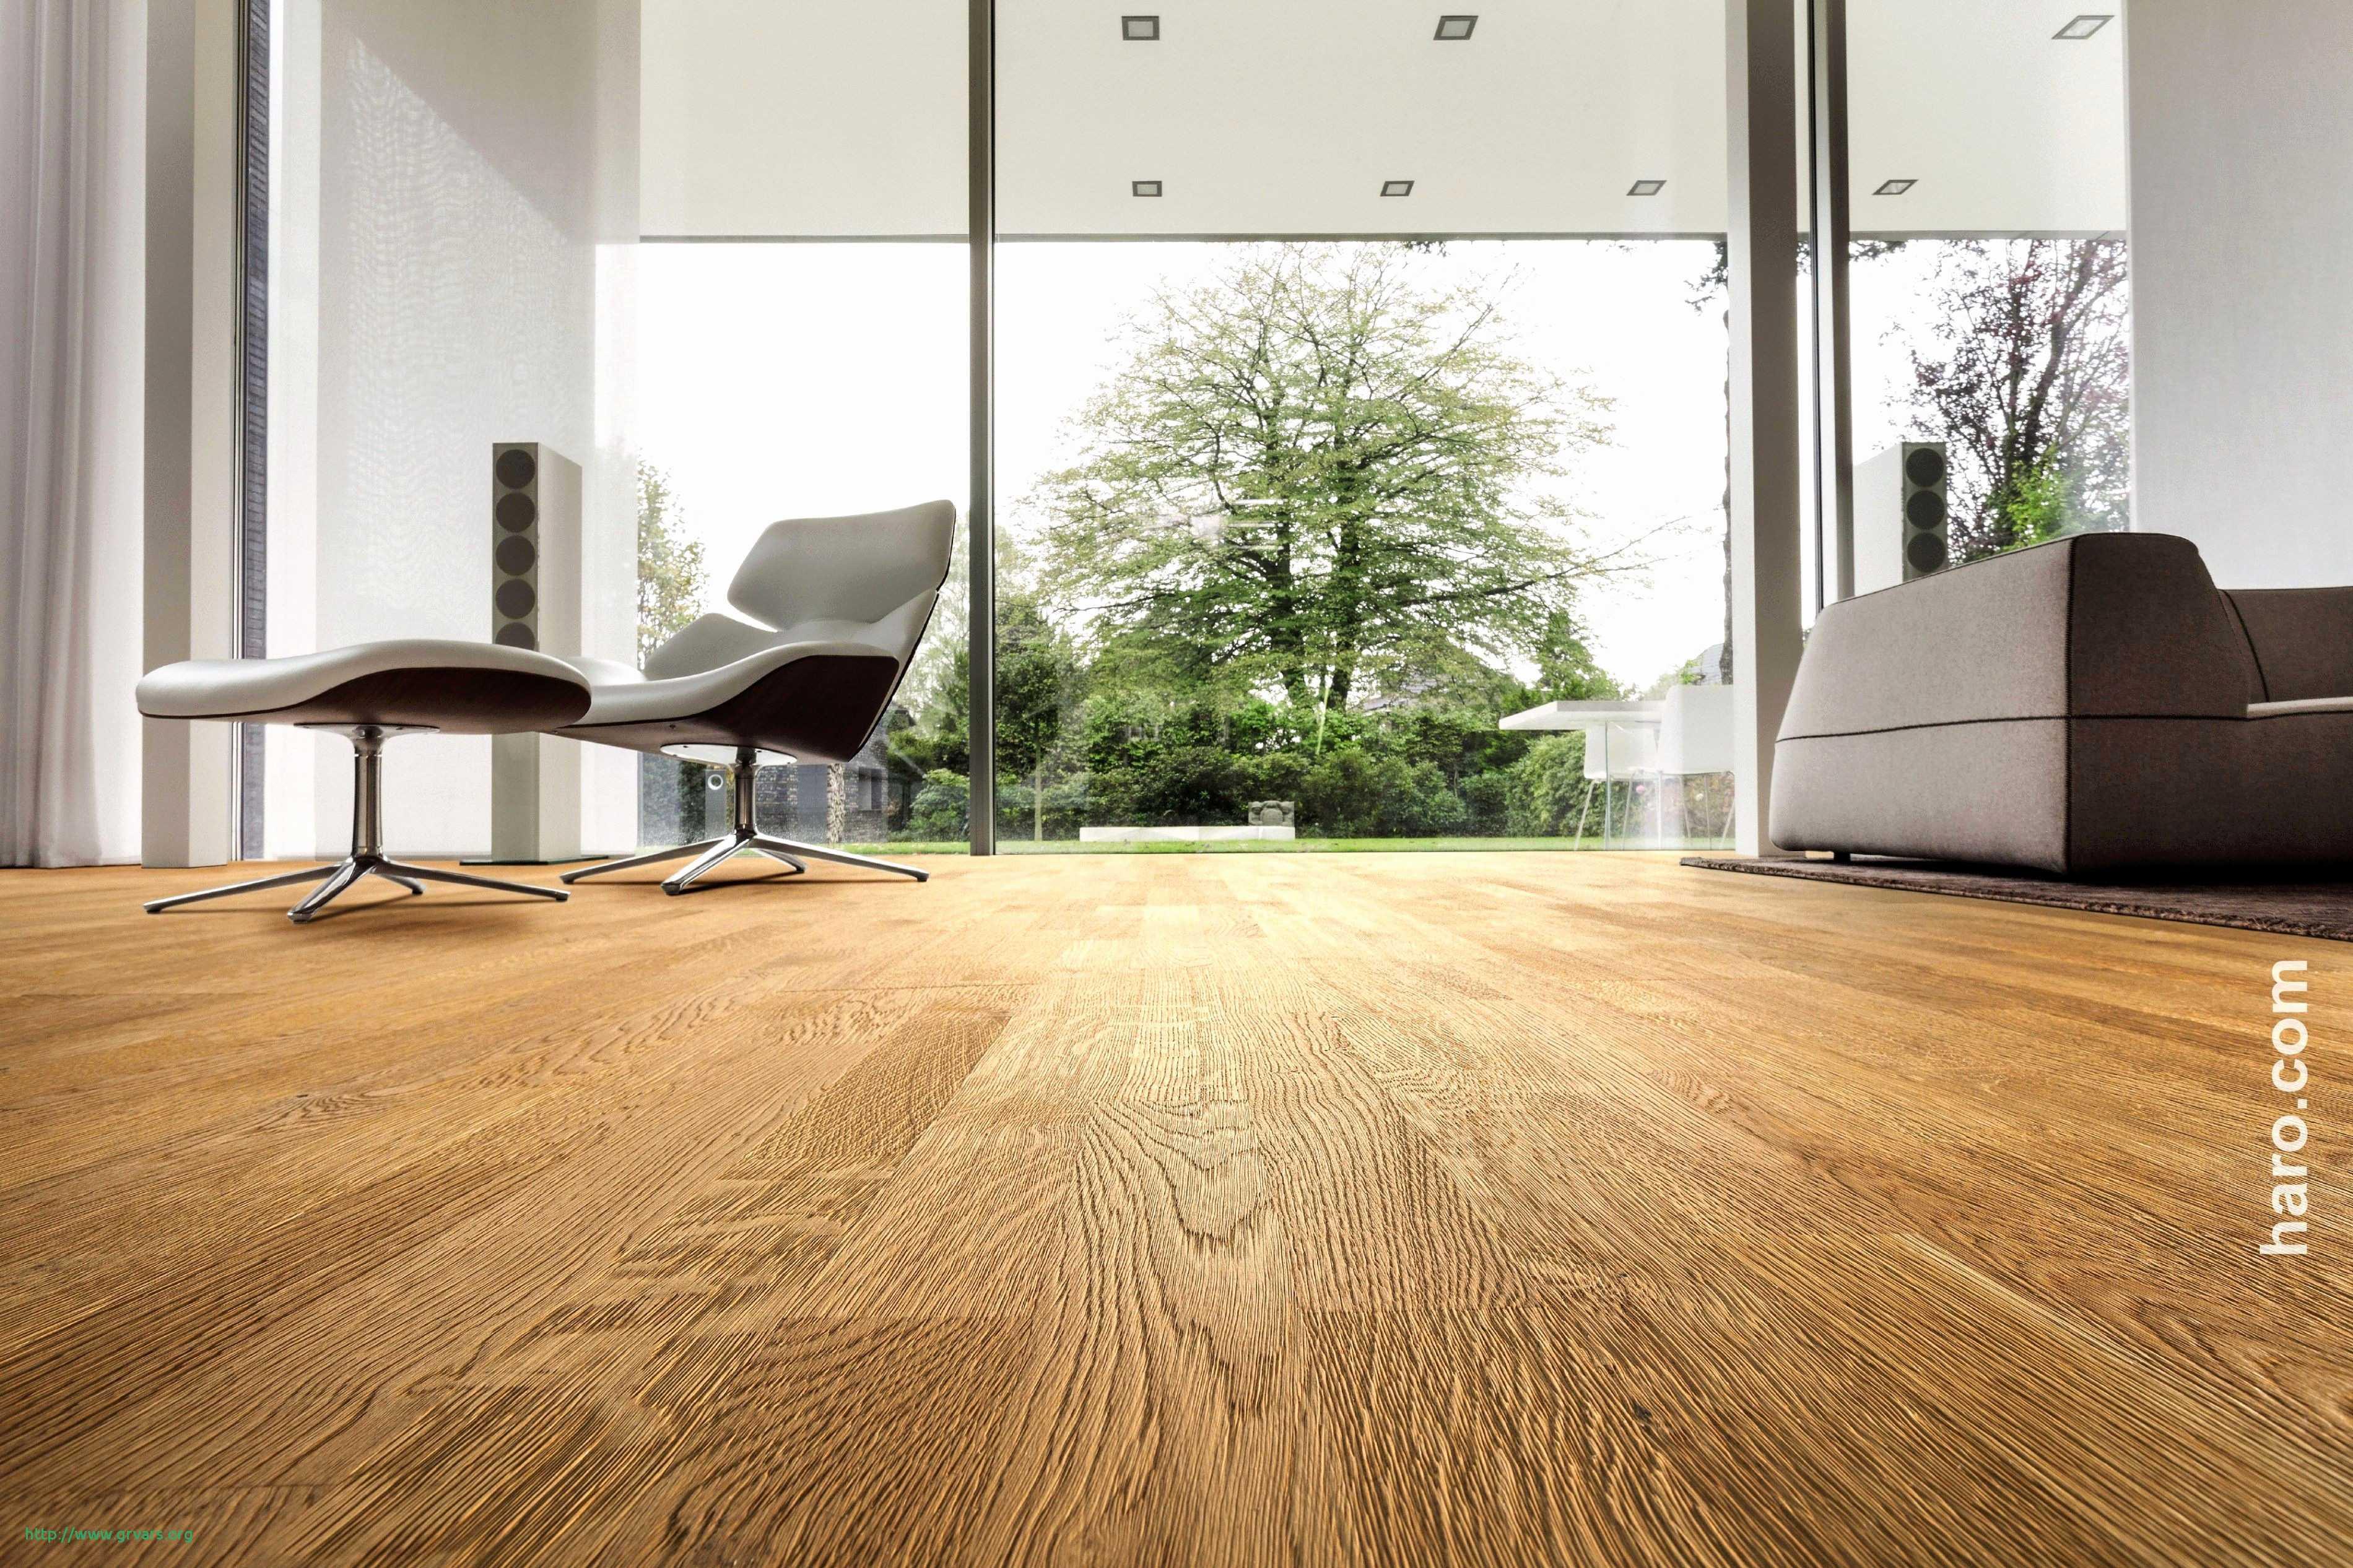 29 Lovable Hardwood Floor Refinishing and Installation ...